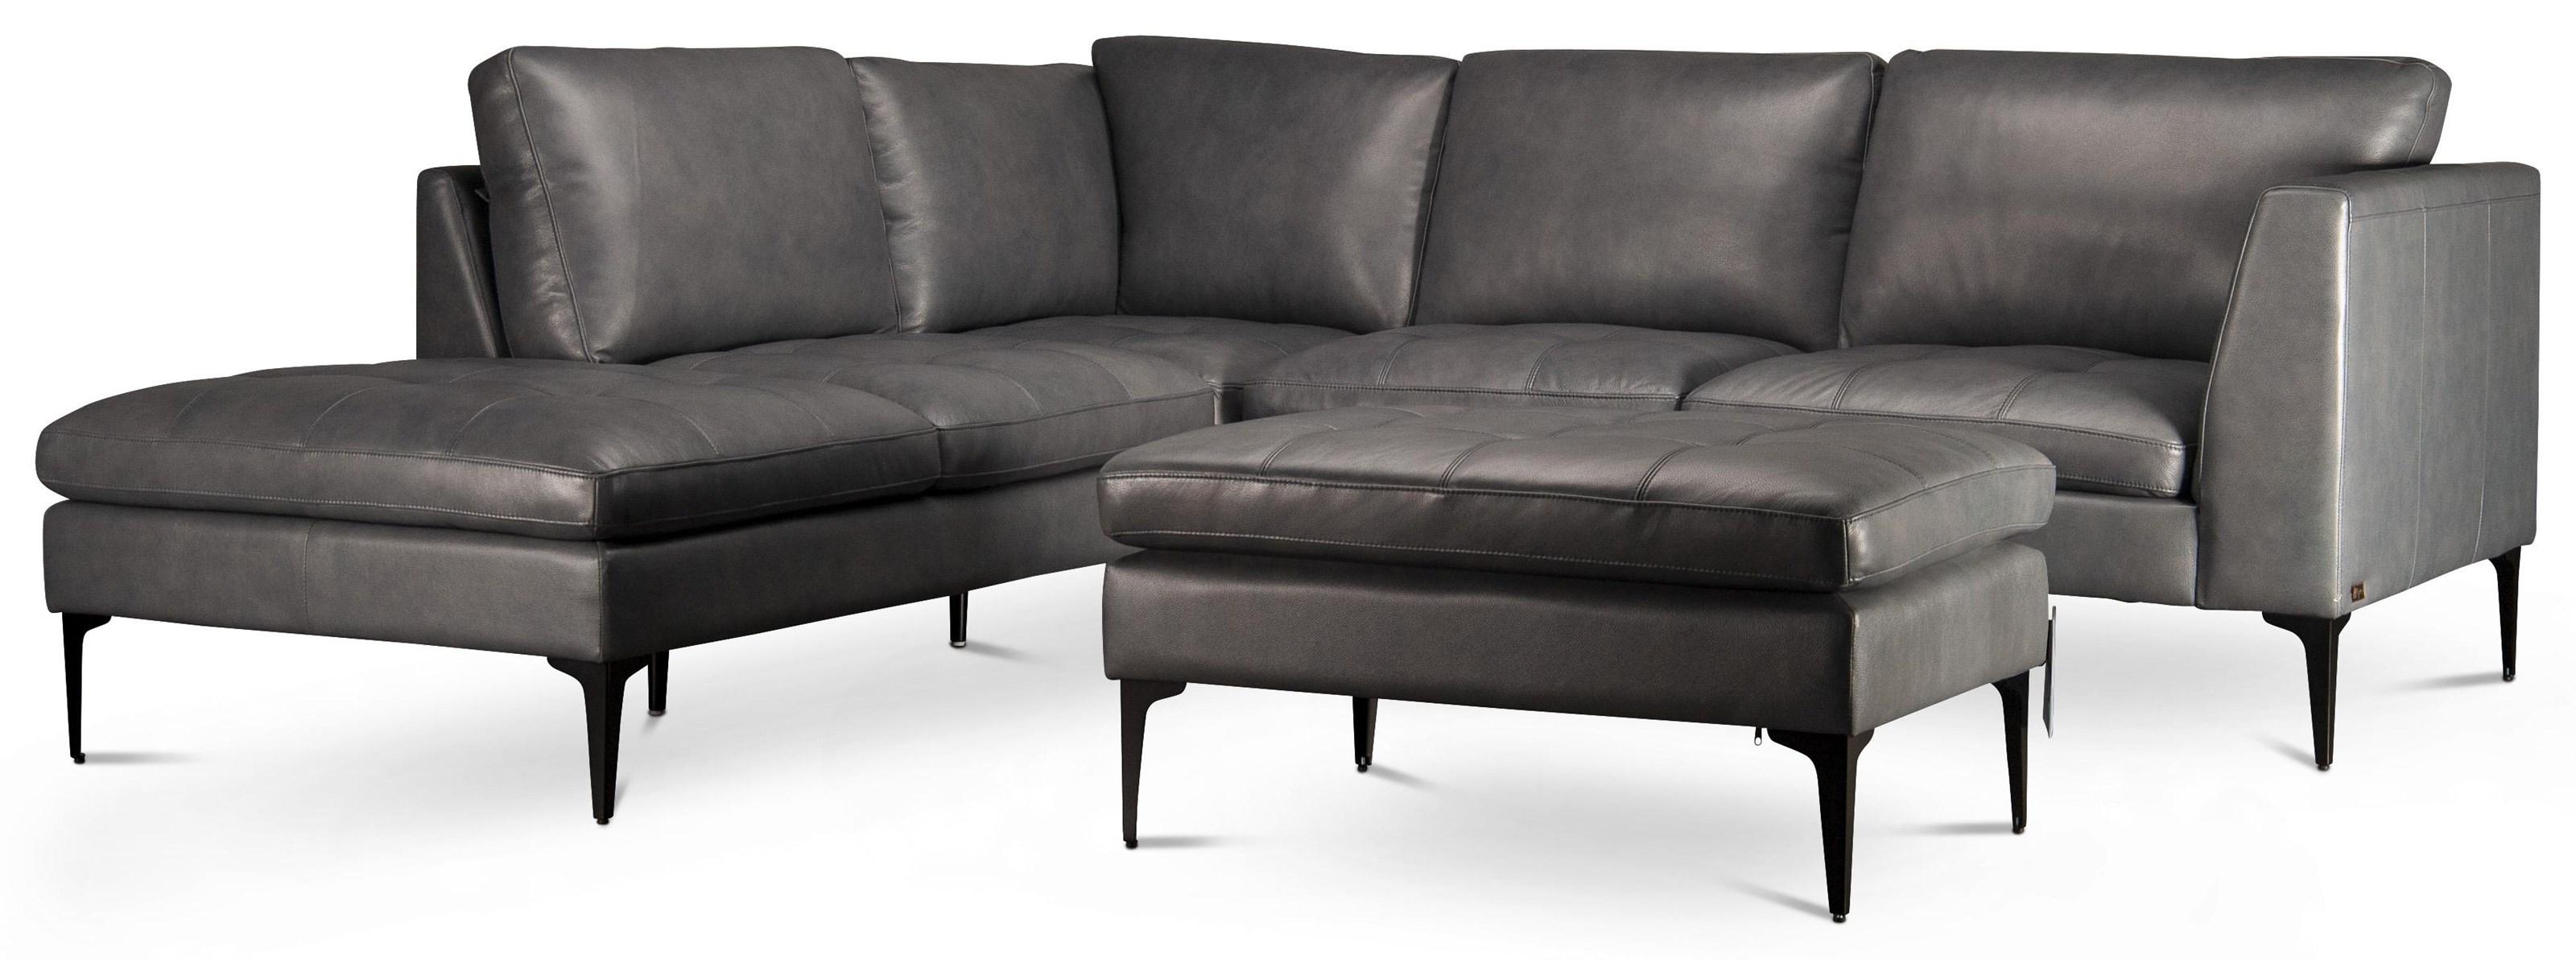 kael kael top grain leather sectional